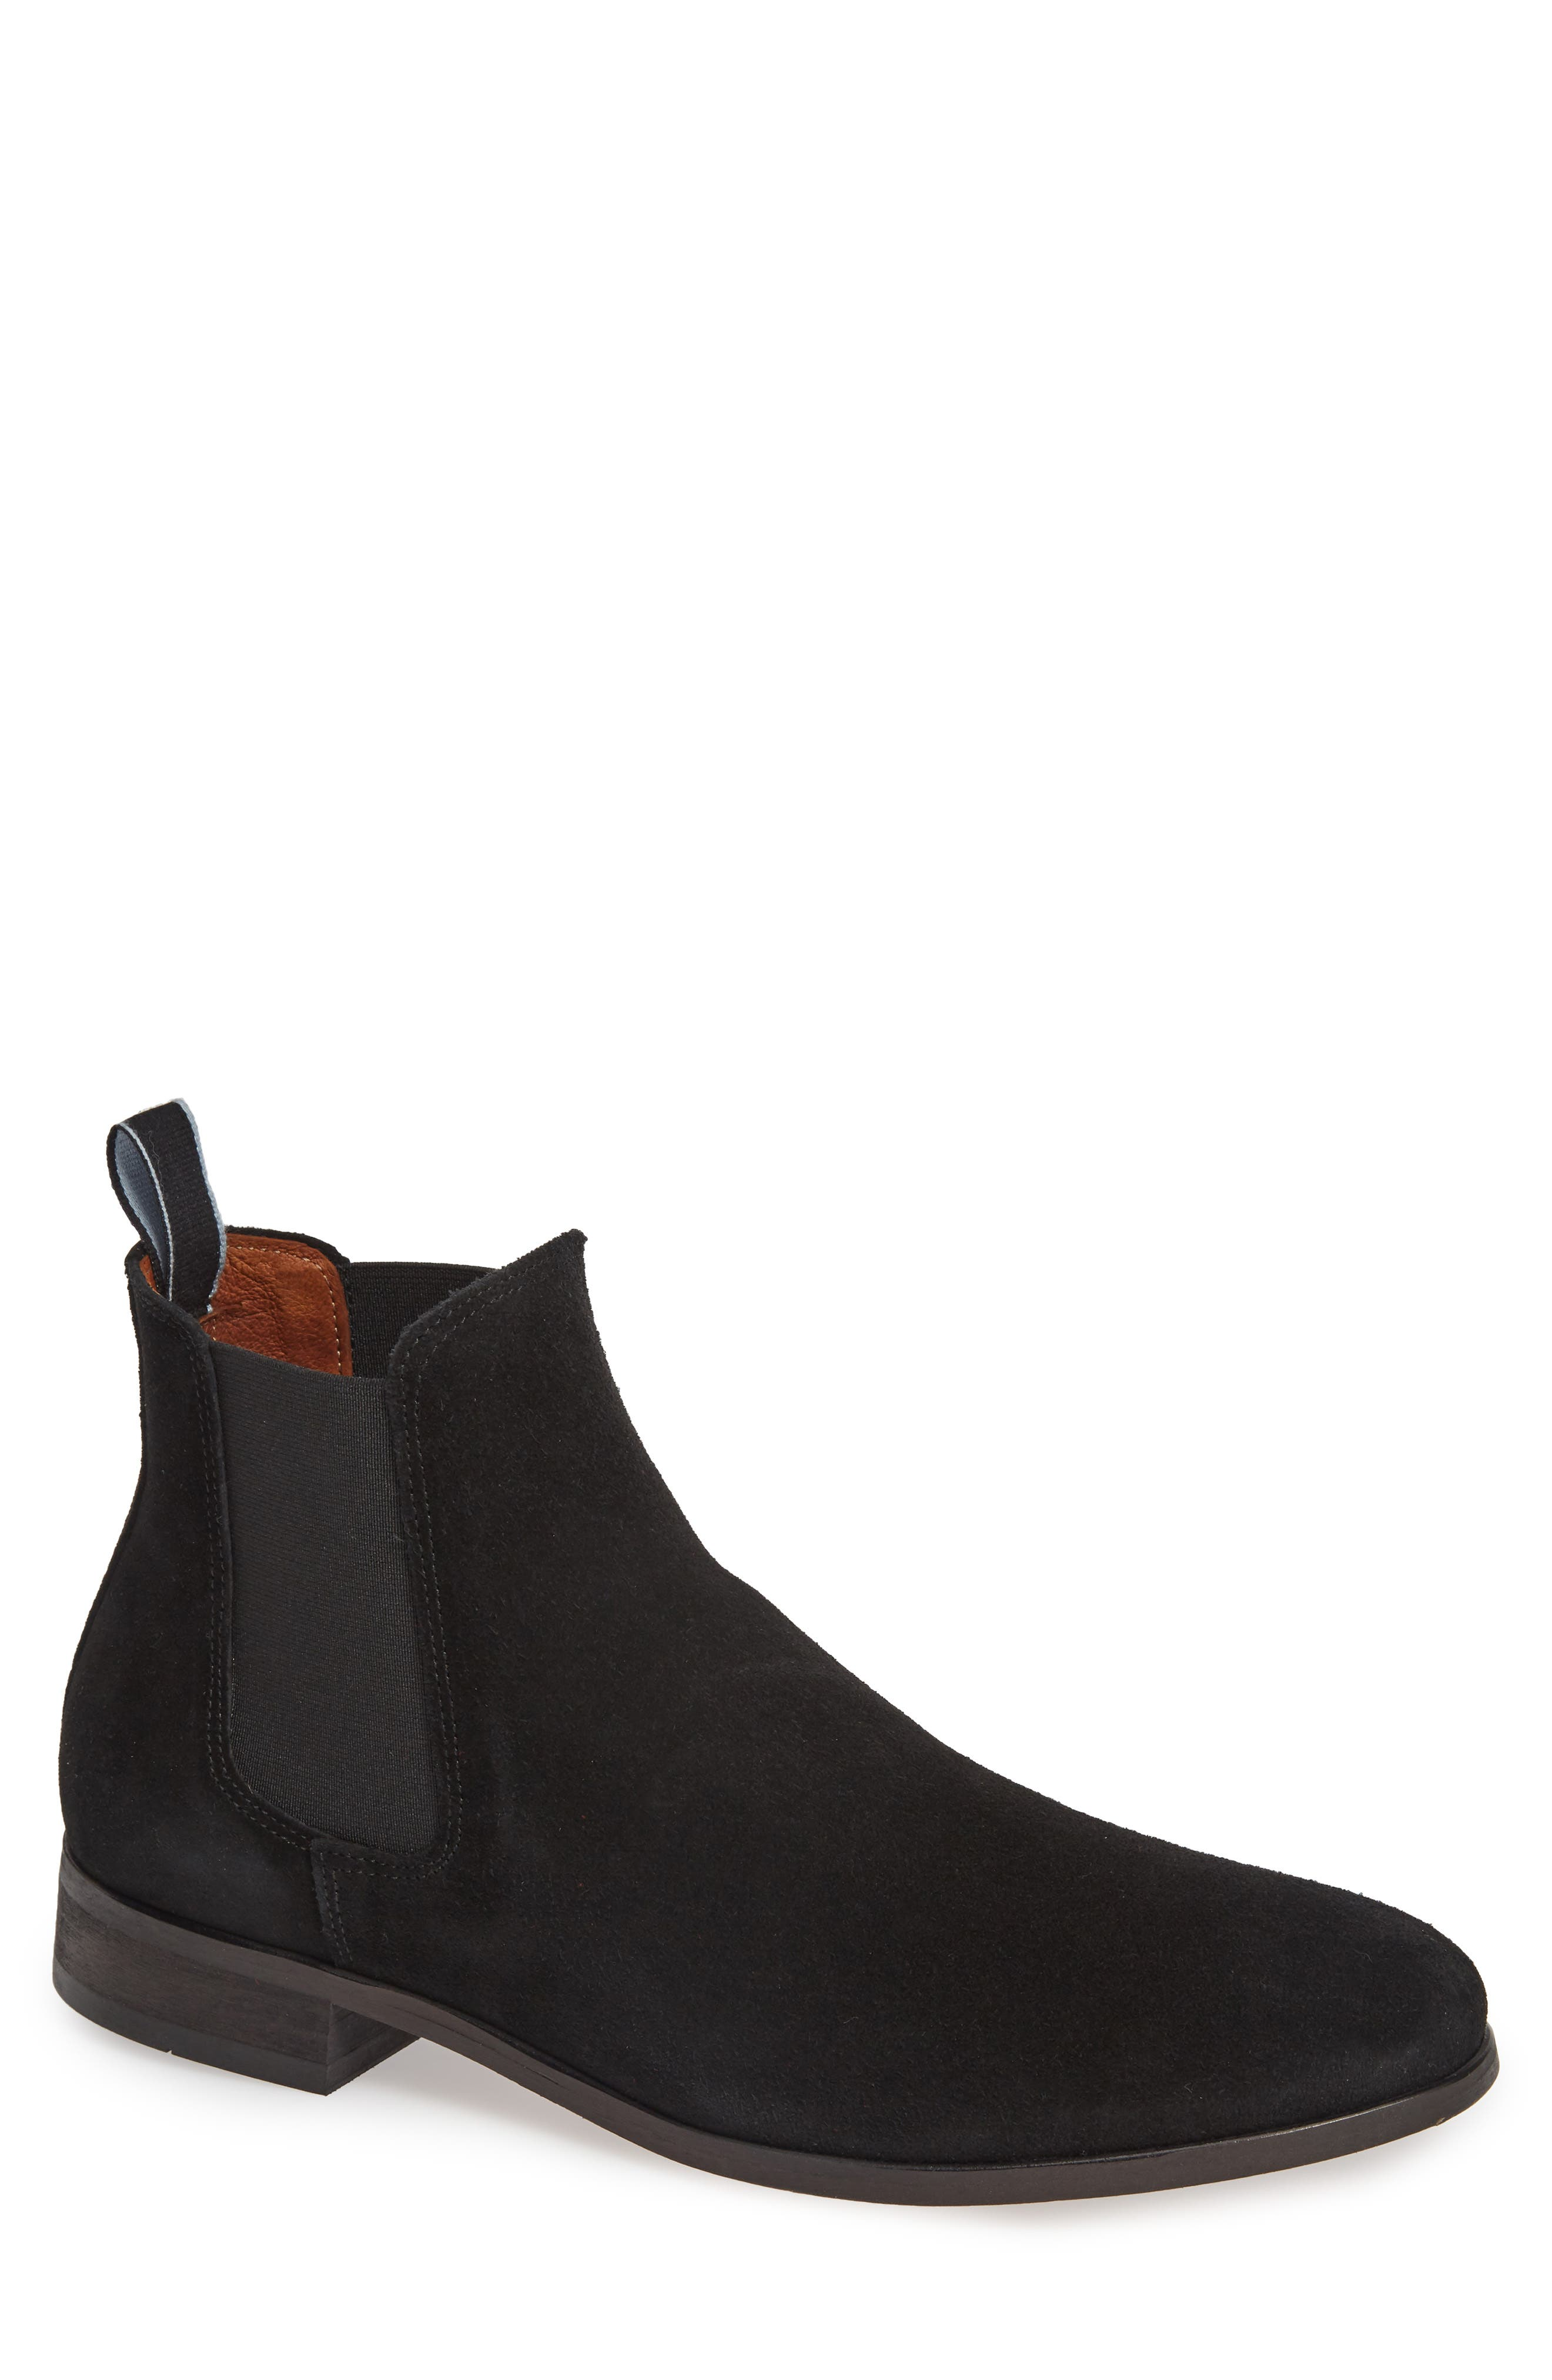 SHOE THE BEAR Dev Chelsea Boot, Main, color, BLACK SUEDE